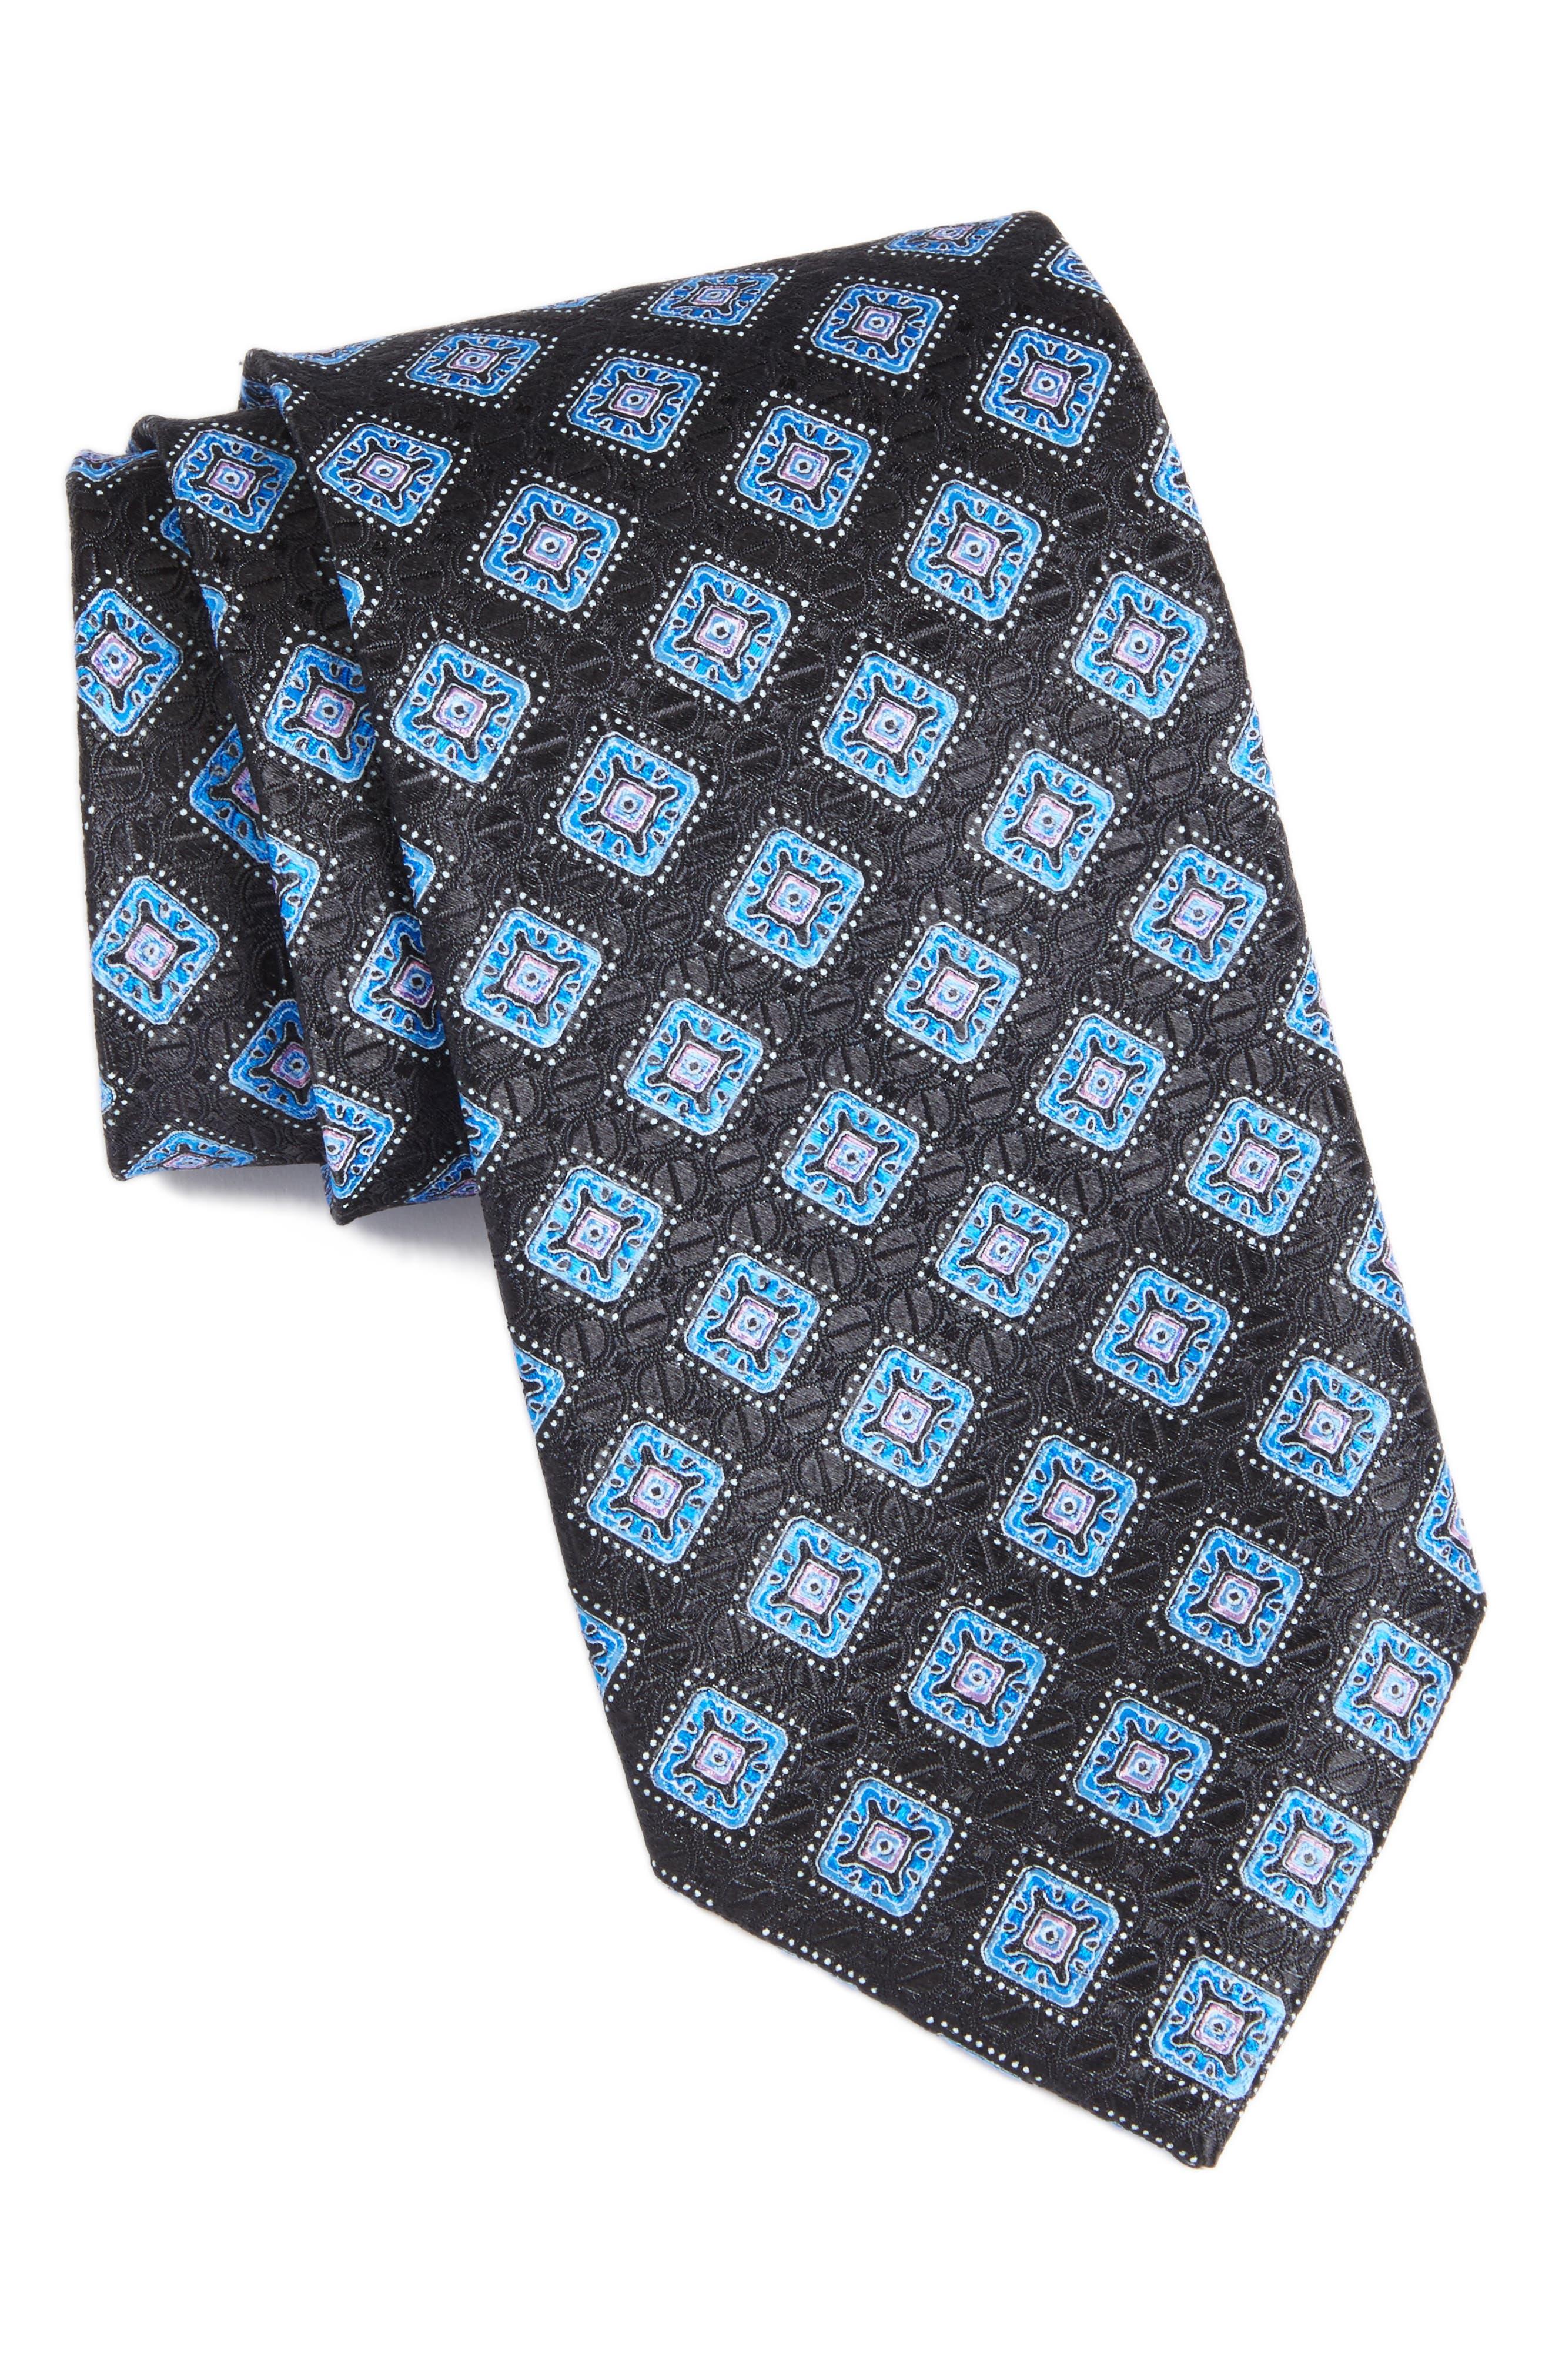 NORDSTROM MENS SHOP Sanders Neat Silk Tie